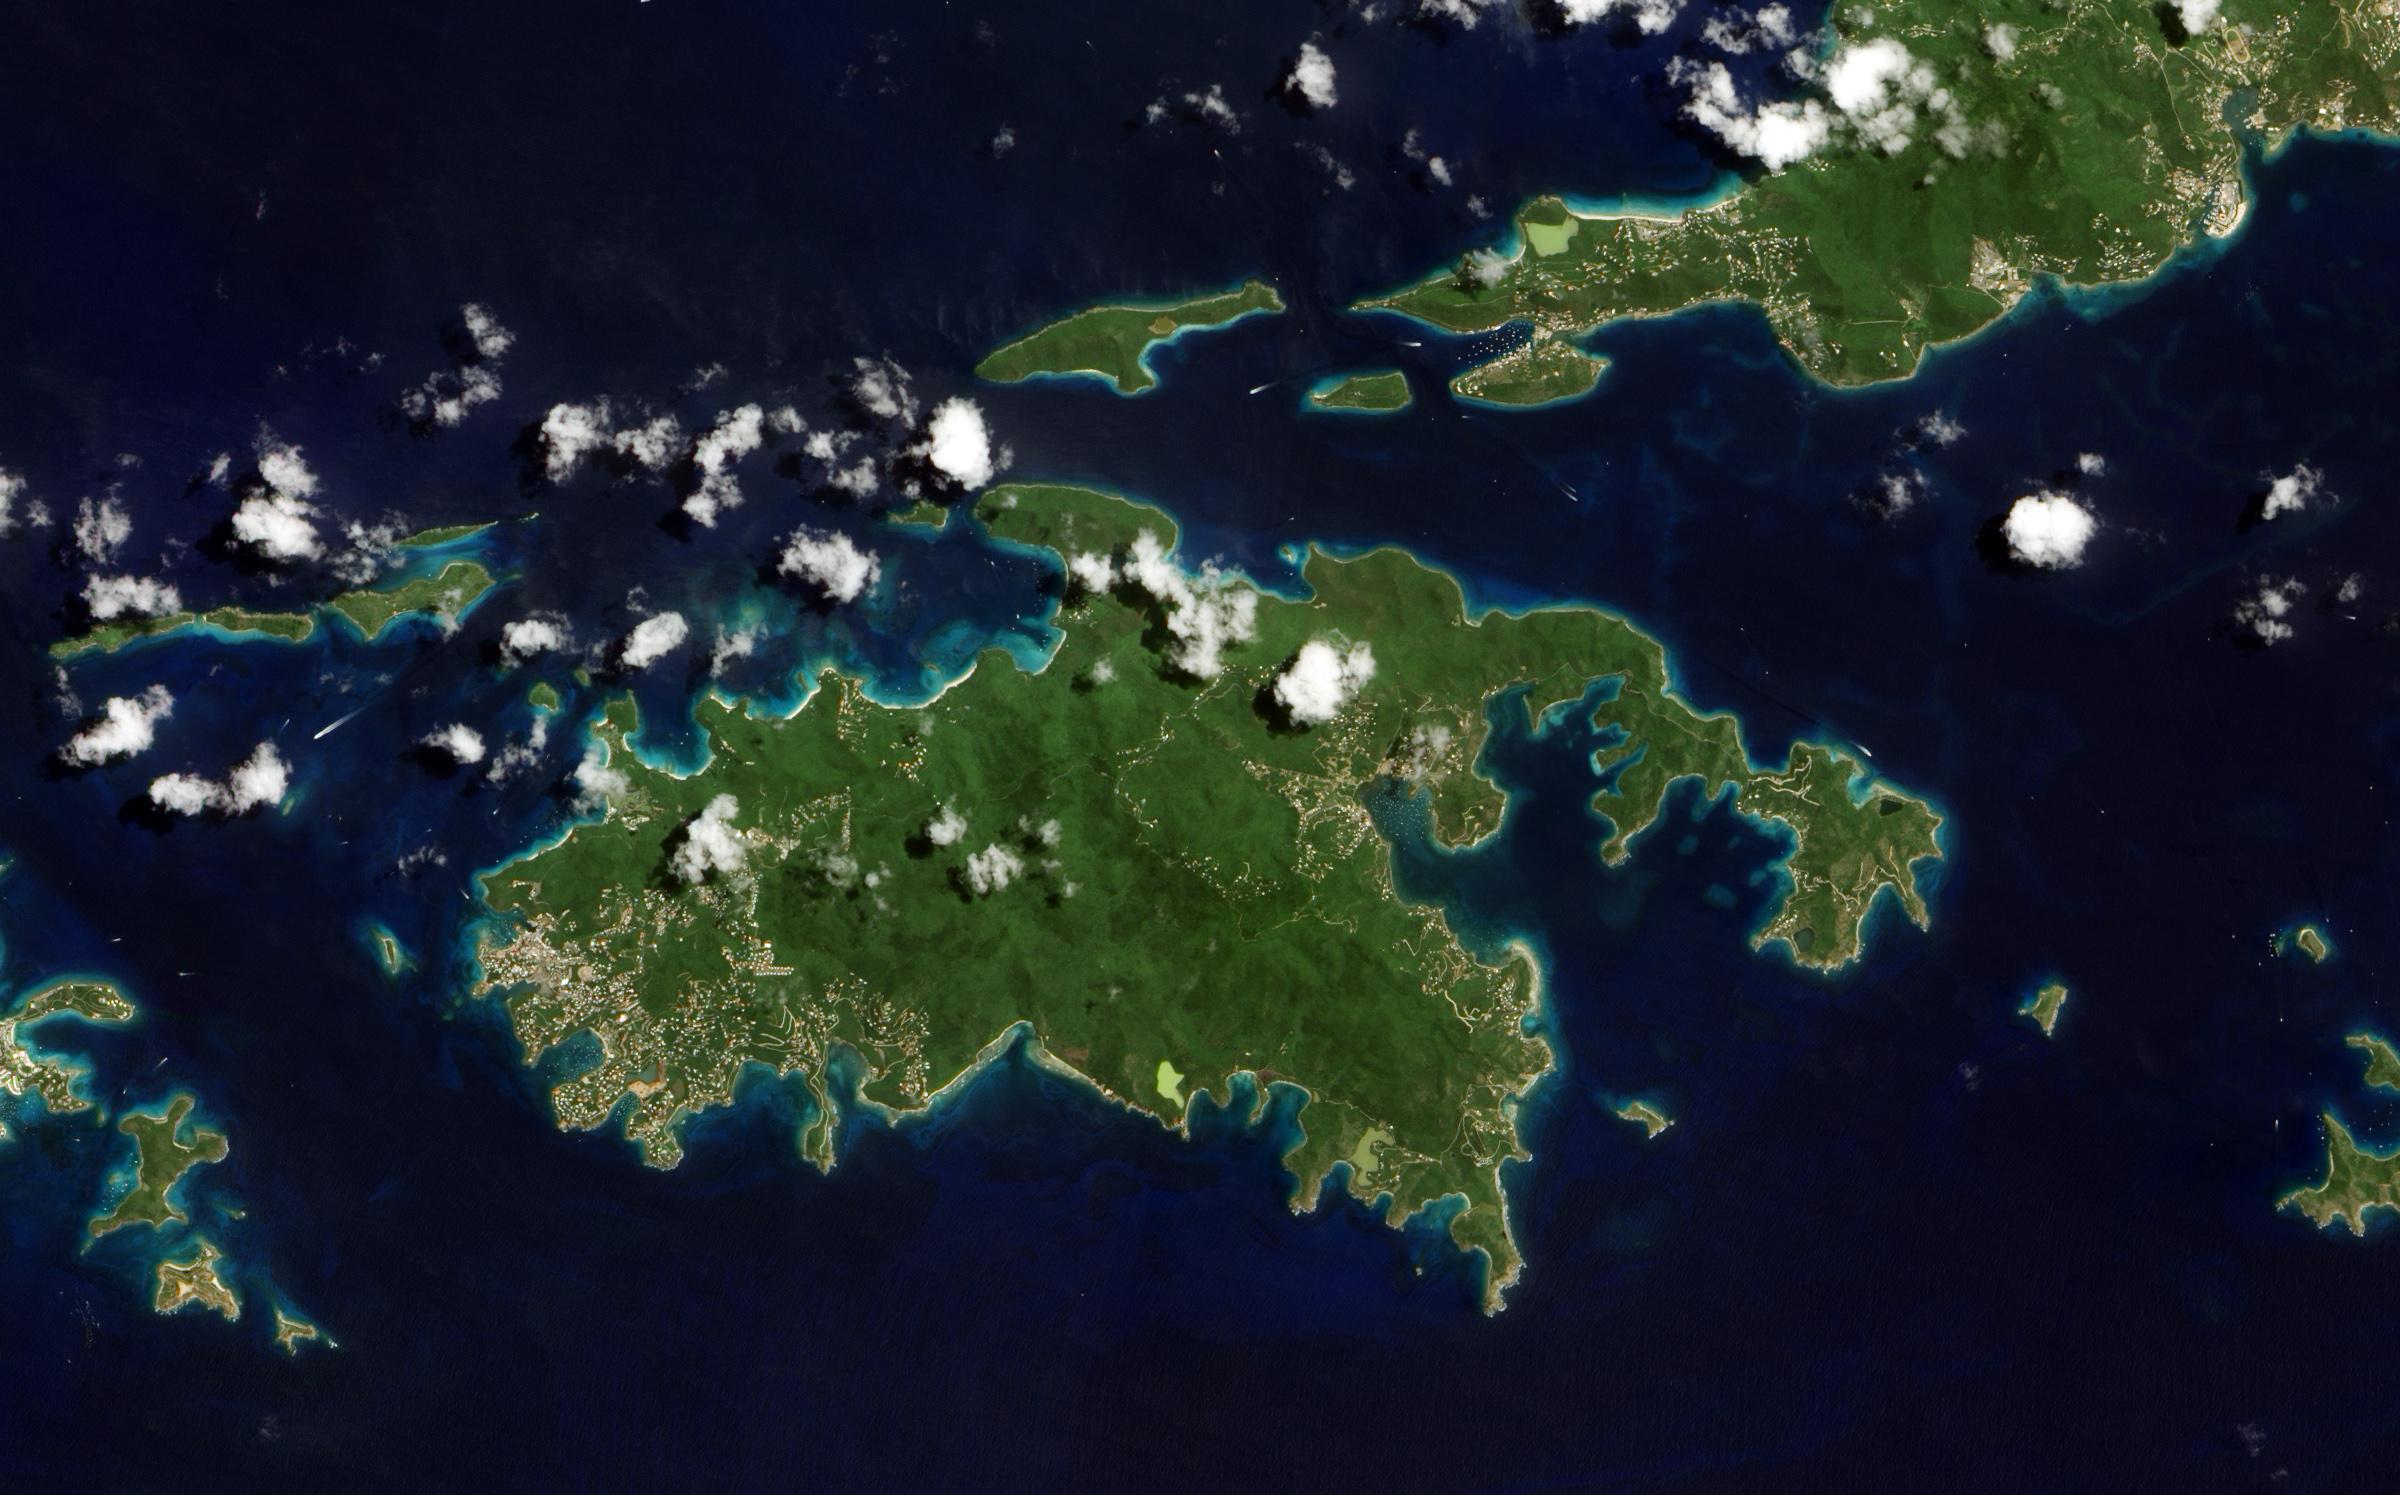 Large Detailed Satellite Map Of St John Island US Virgin Islands - World satellite map application